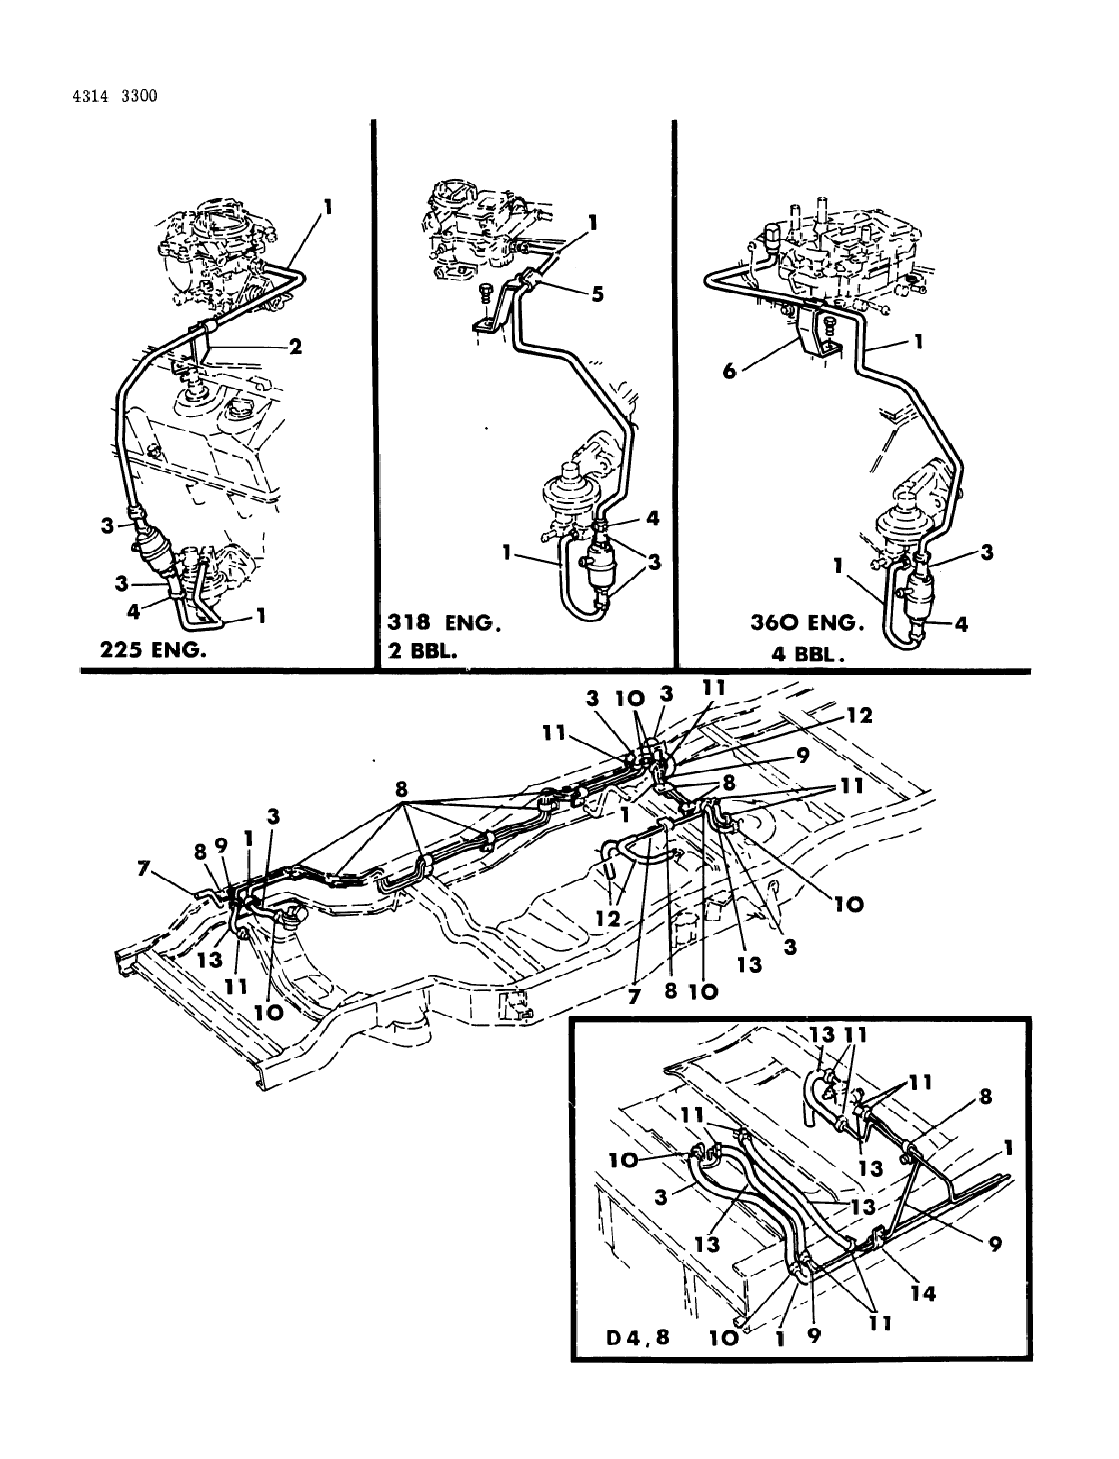 318 engine fuel line diagram | wiring library 318 engine fuel line diagram 1999 mustang 3 8 engine fuel line diagram #5